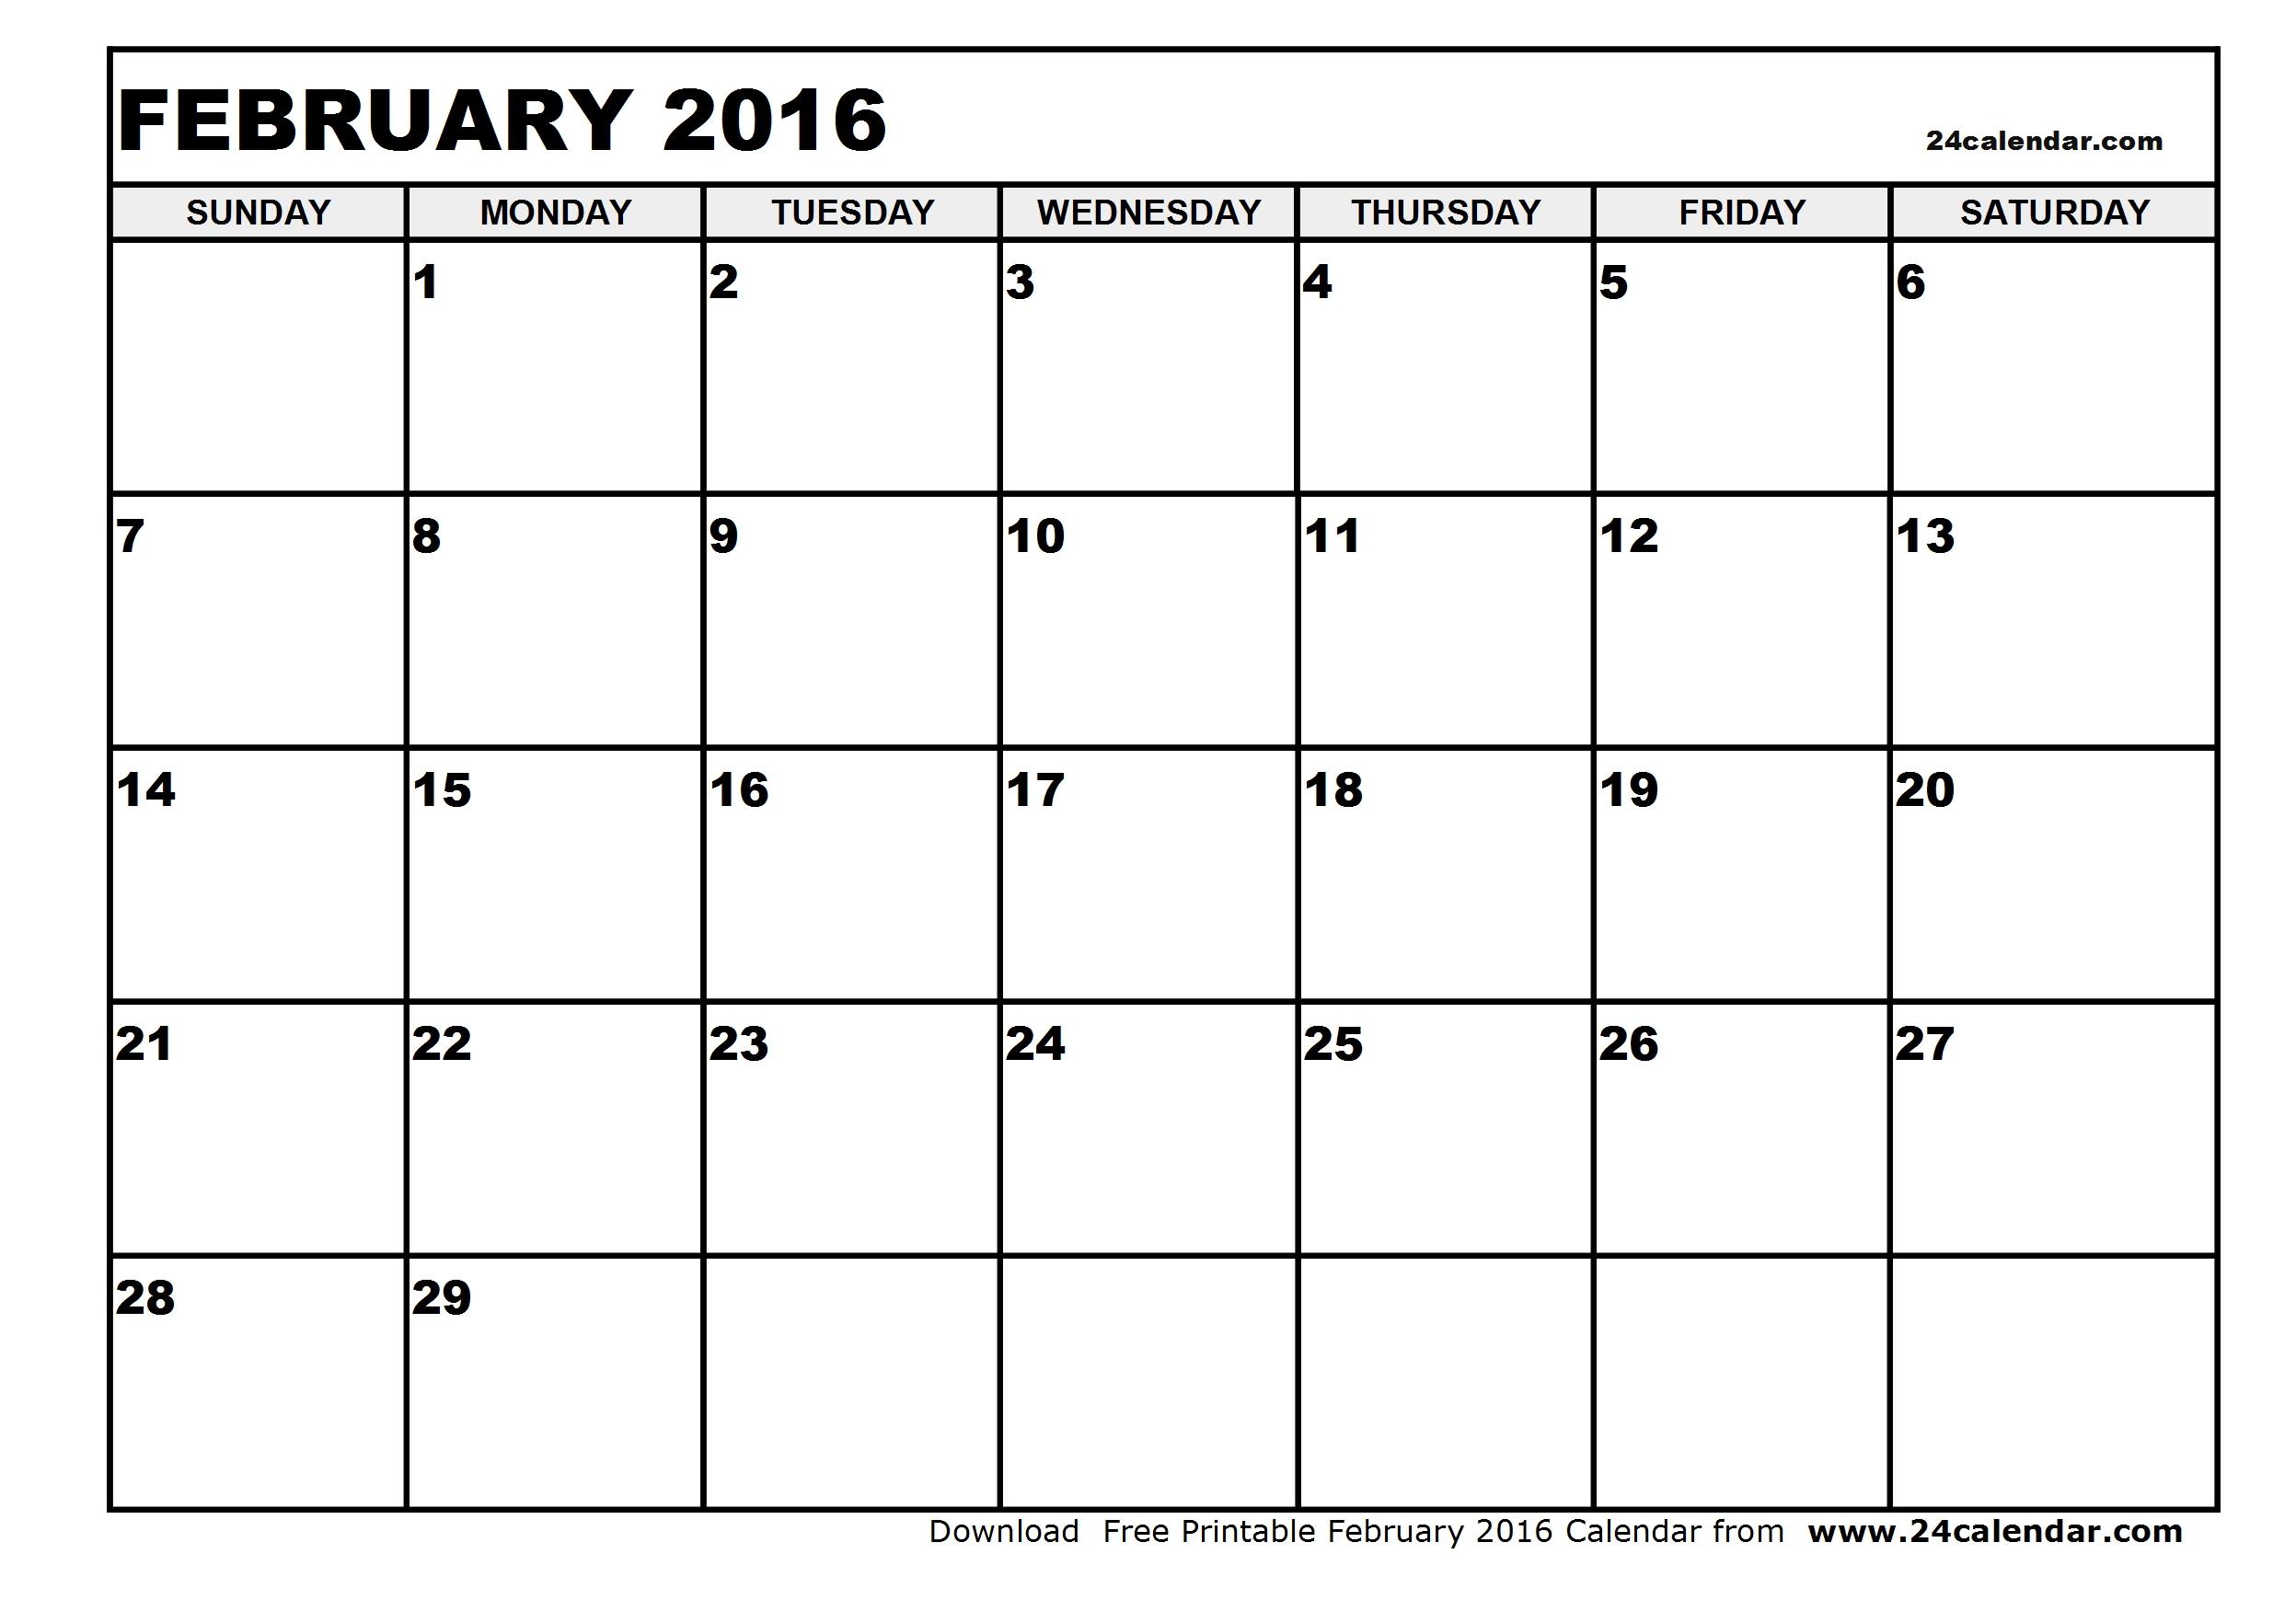 Free Printable Calendars 2016 February | Blank Calendar Design 2017